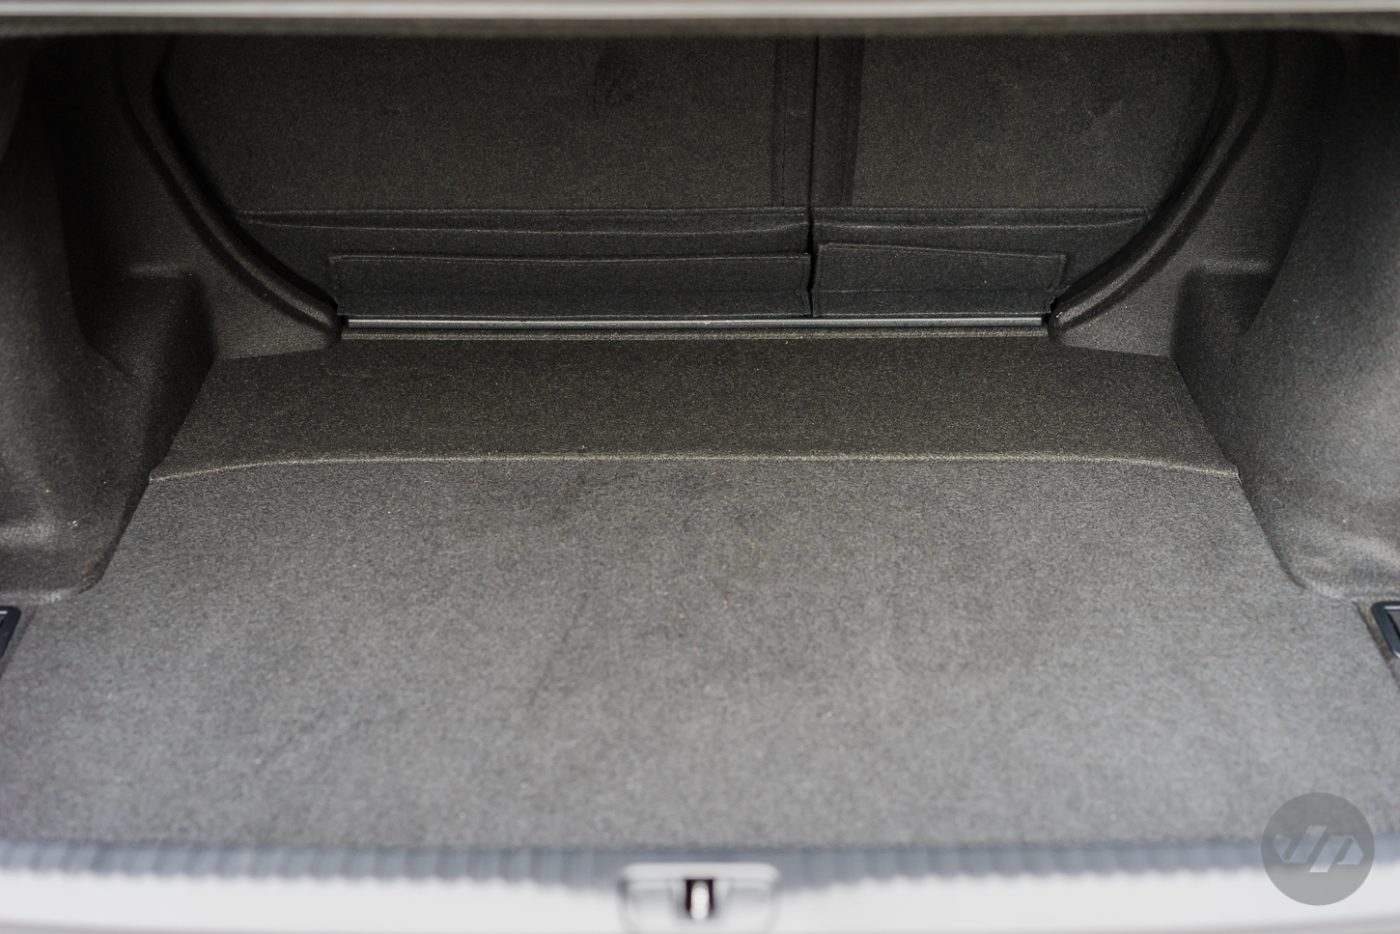 Fatlace-LexusRC350-9